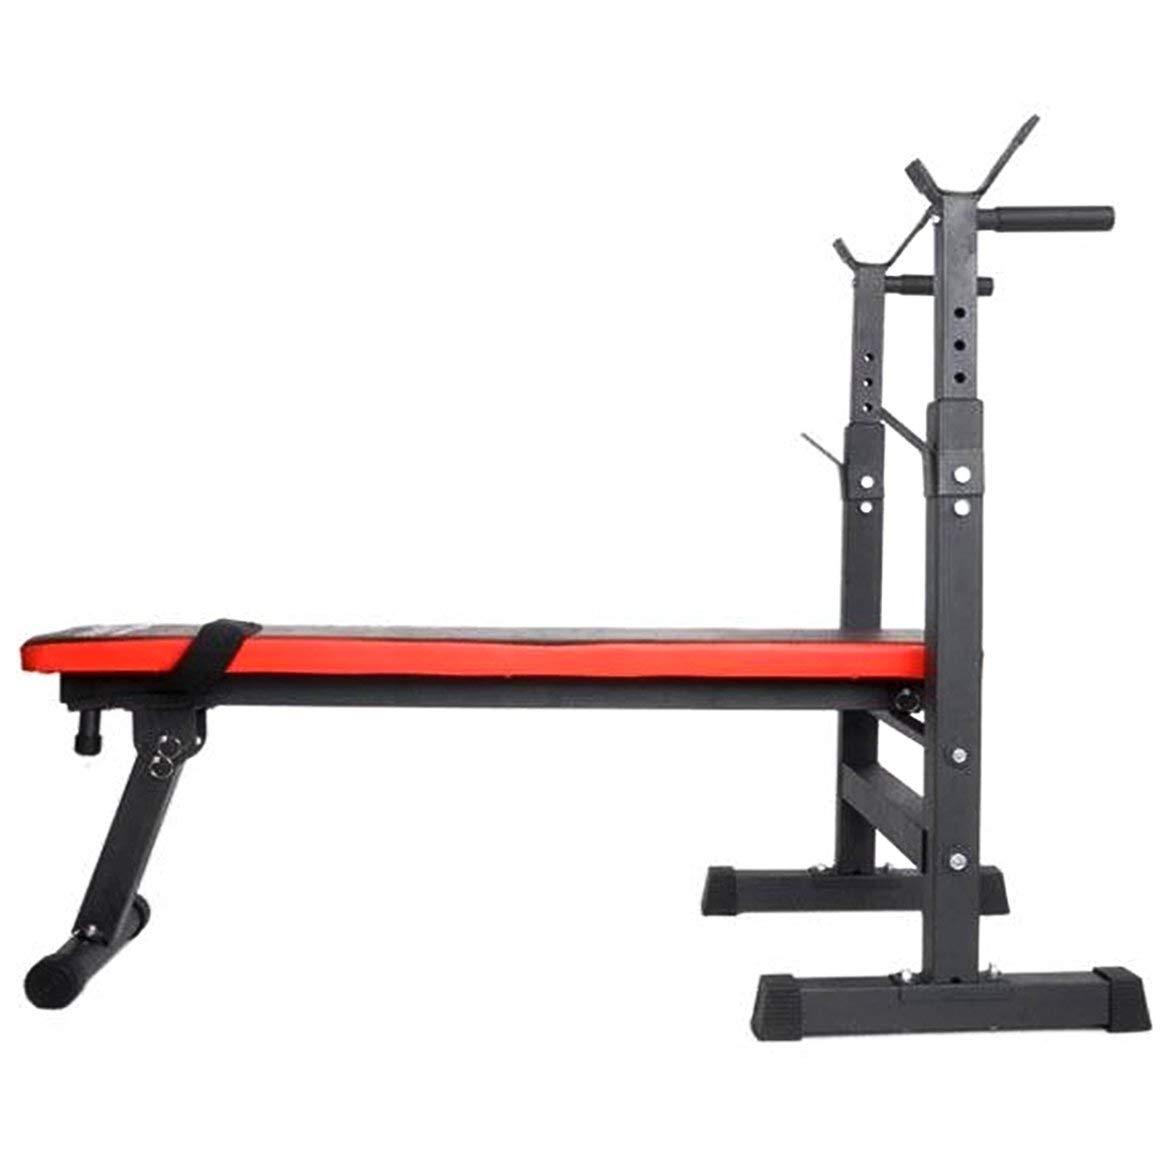 Funnyrunstore Heavy Duty Gym Schulter Brustpresse Sit Up Gewichte Bench Barbell Fitness Ganzkörpertraining Trainingsgeräte